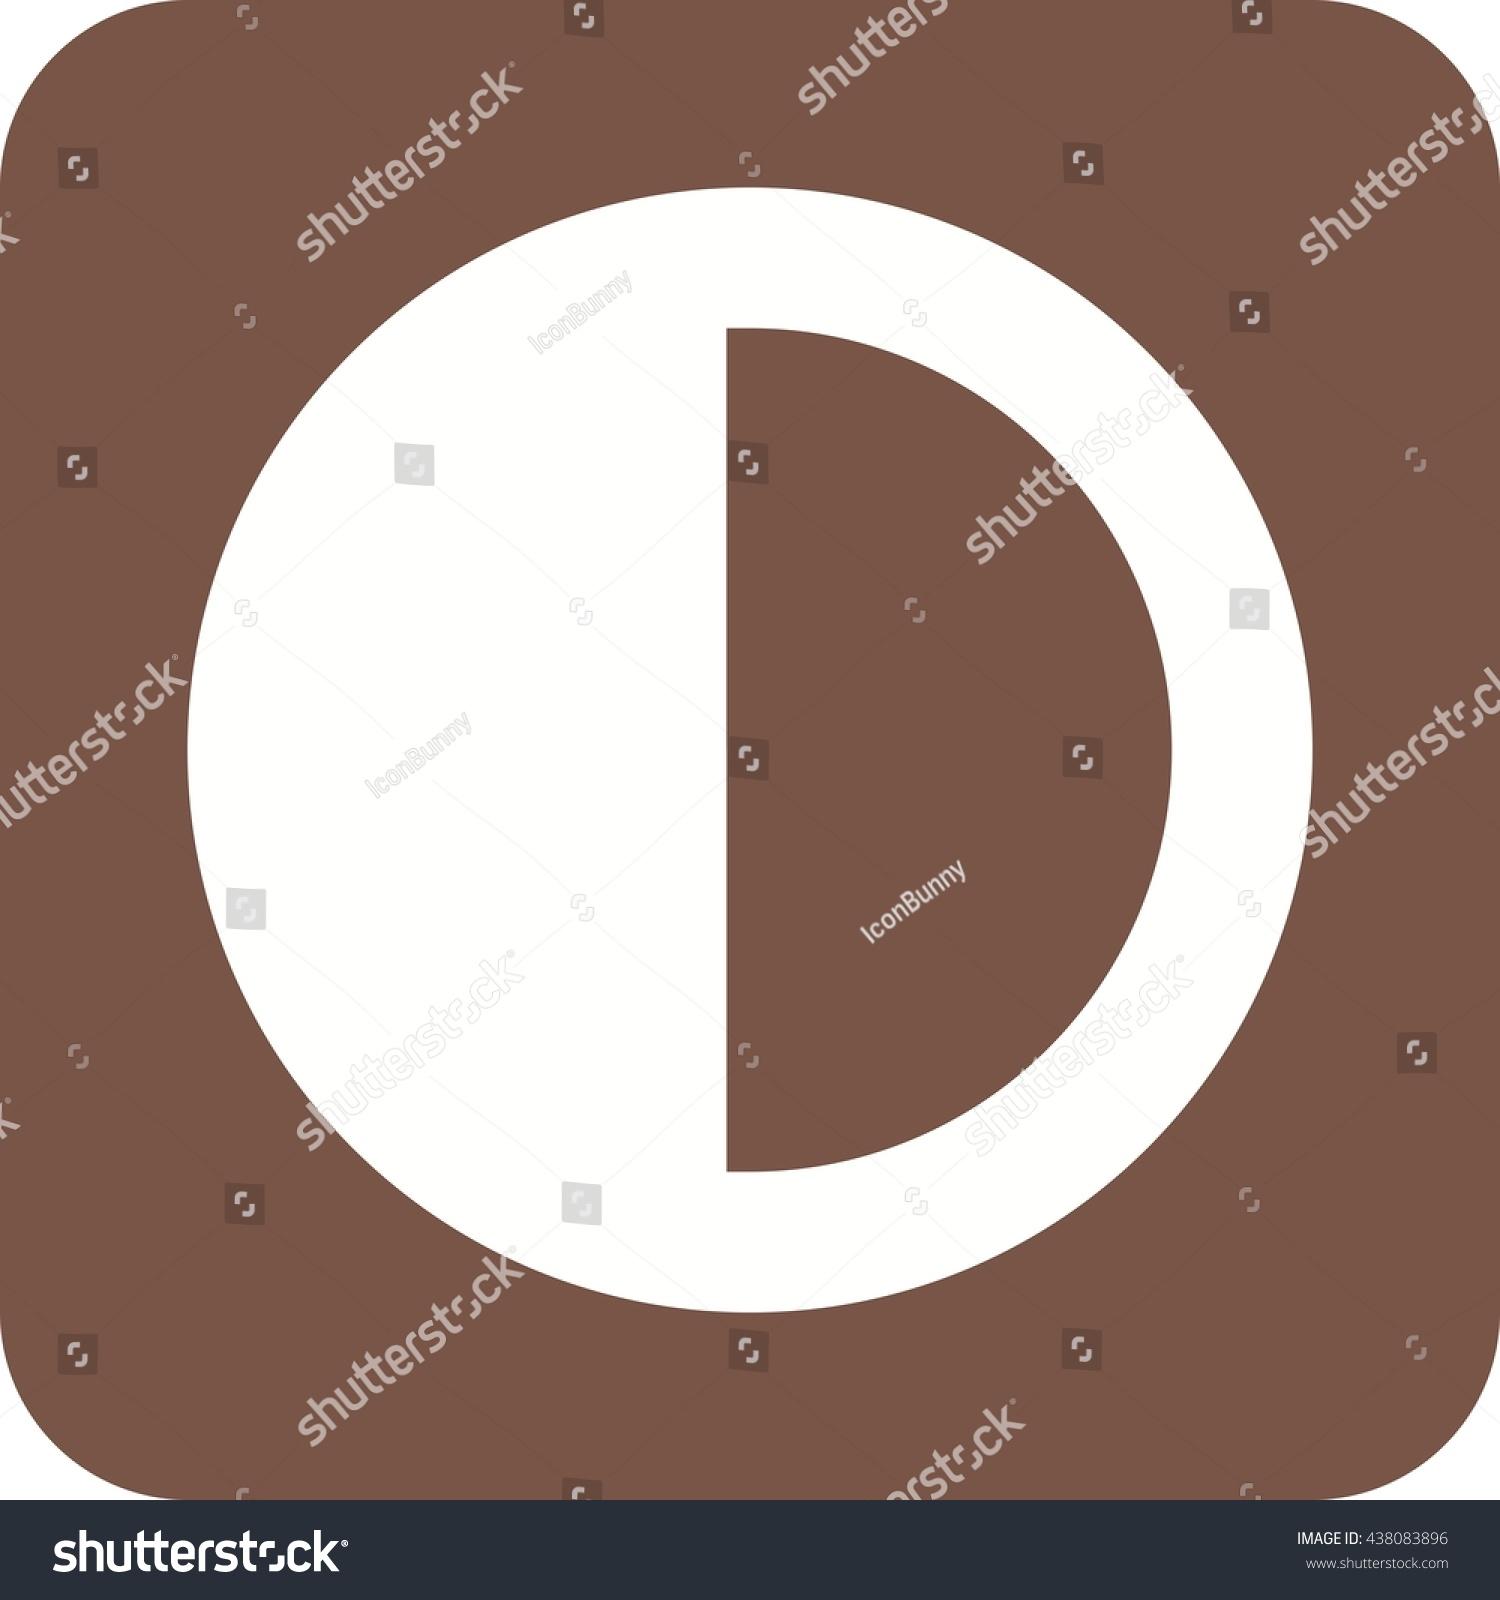 Half Pie Chart Stock Vector Royalty Free 438083896 Shutterstock